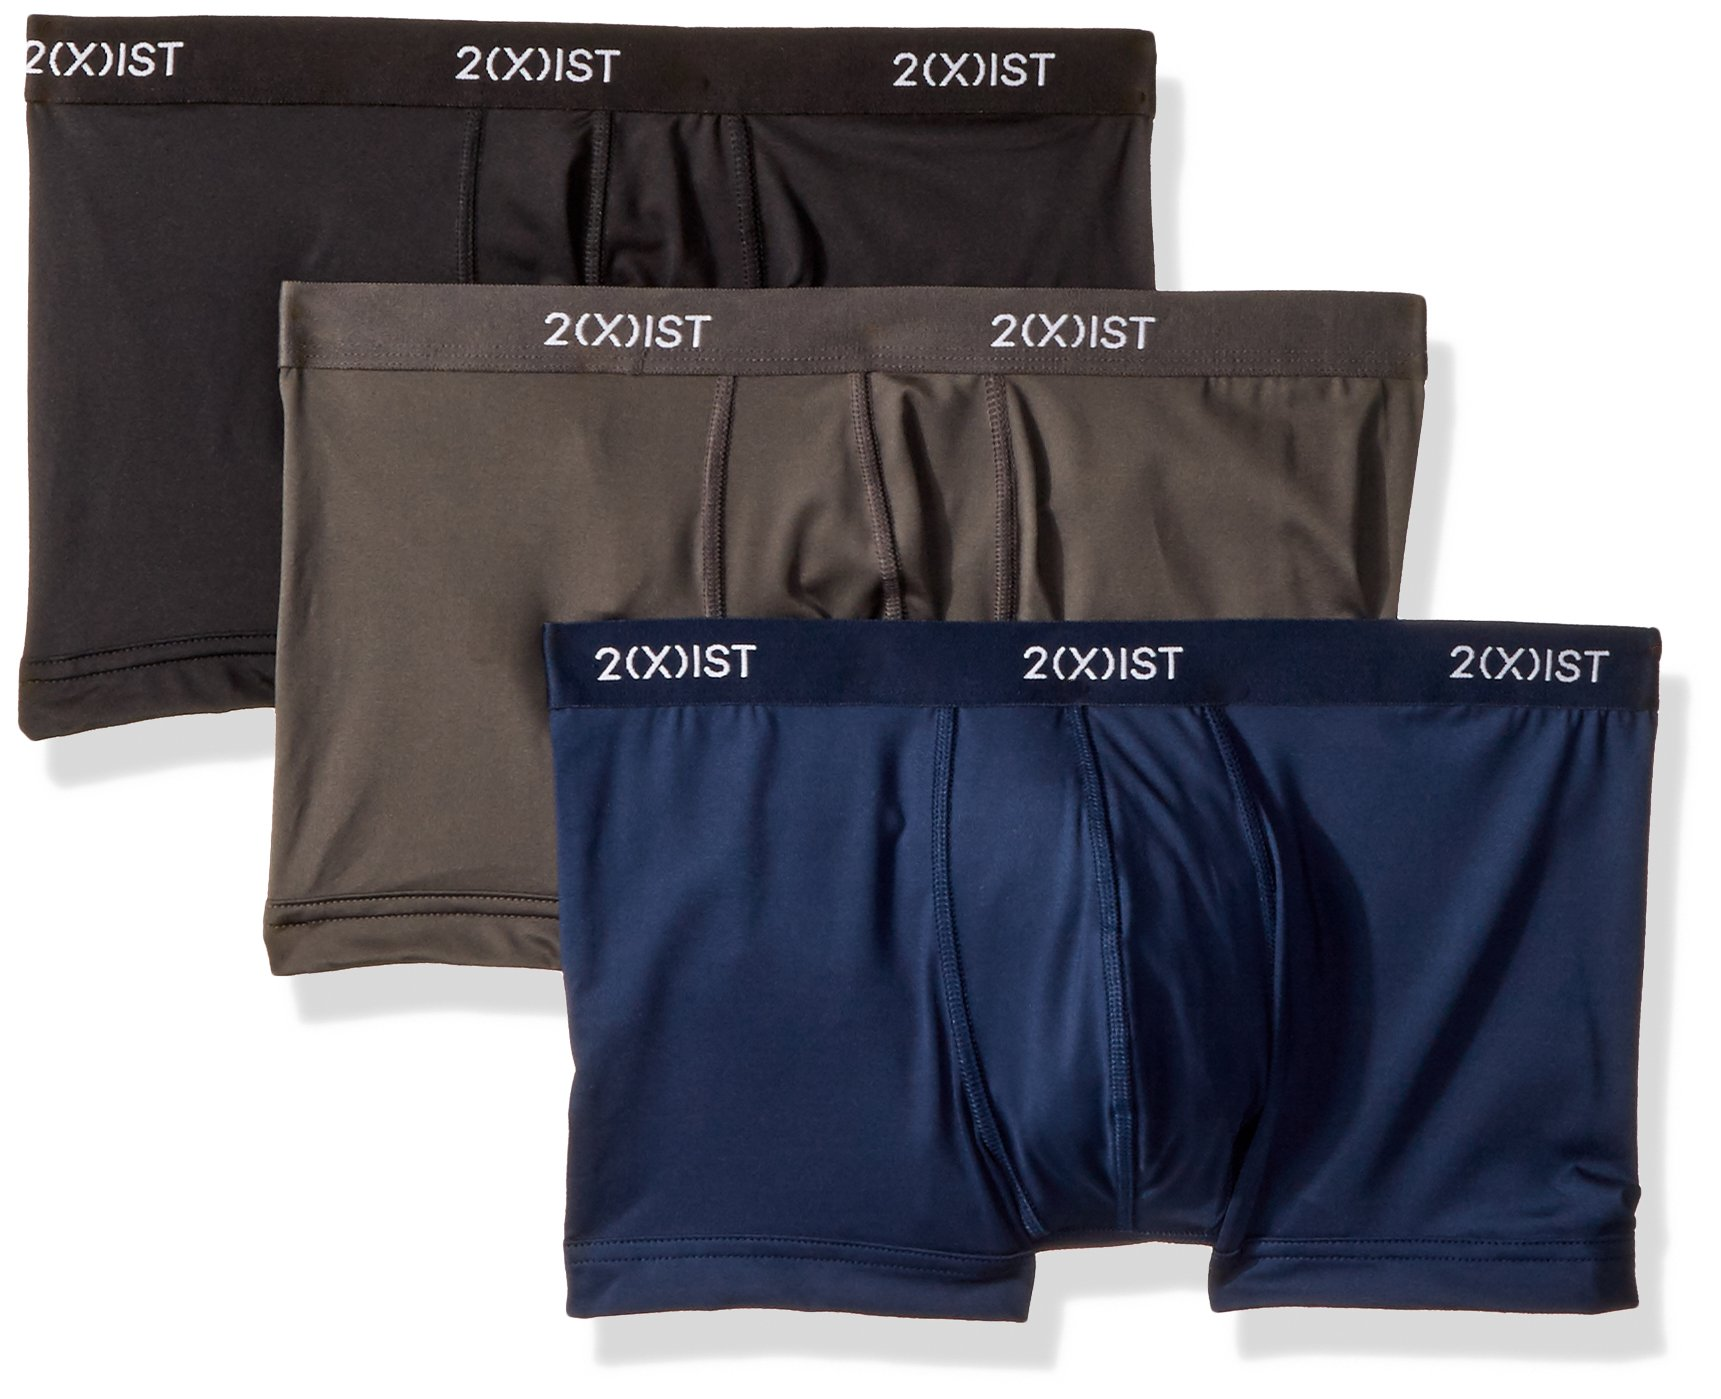 2(X)IST Men's Micro Speed Dri 3PK No-Show Trunk Underwear, Black/Charcoal/Varsity Navy, Medium by 2(X)IST